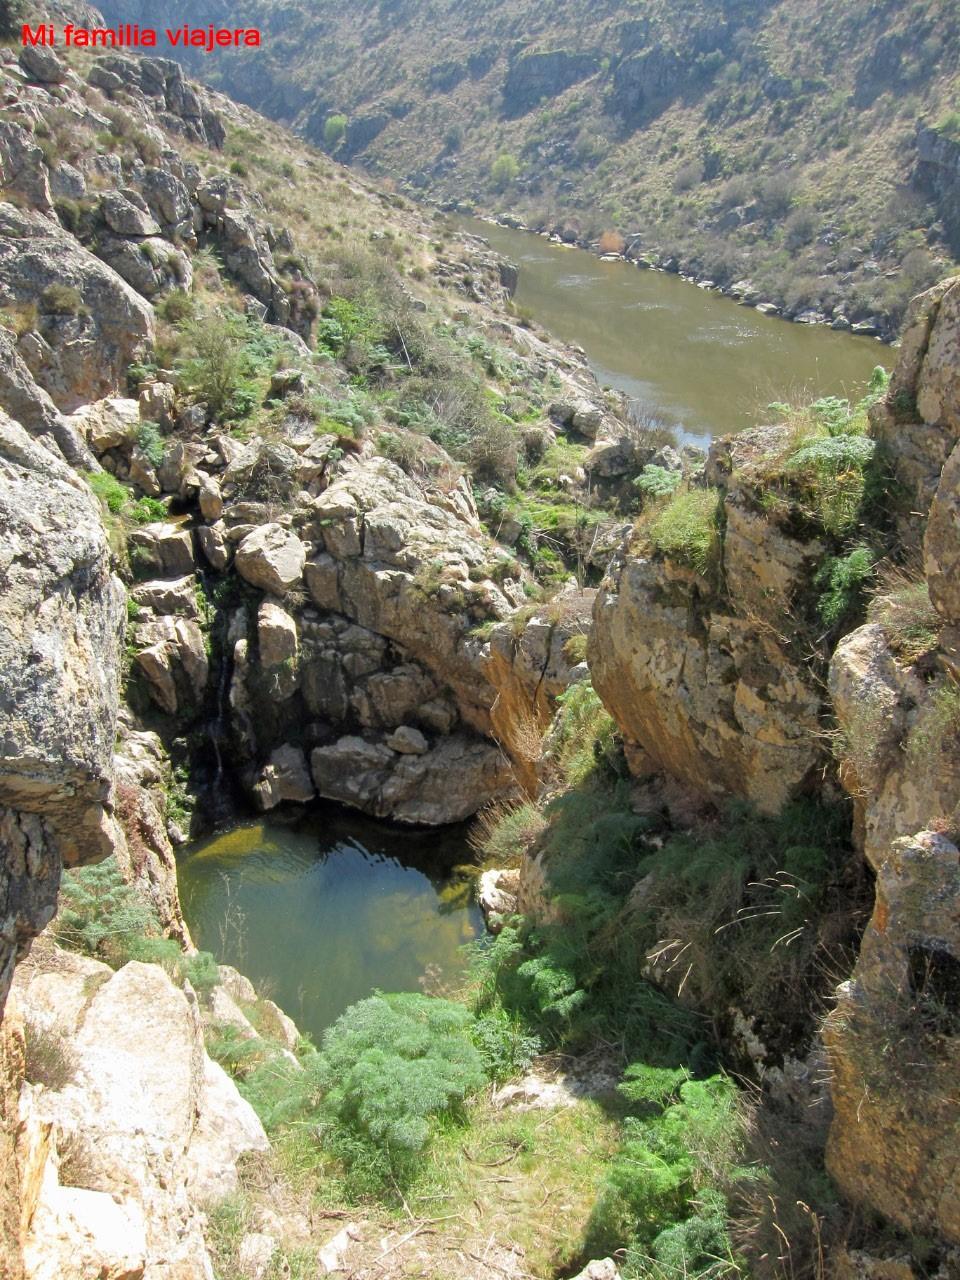 Senda Cascadas de Las Pilas-Arribes del Duero, Almaraz de Duero, Zamora